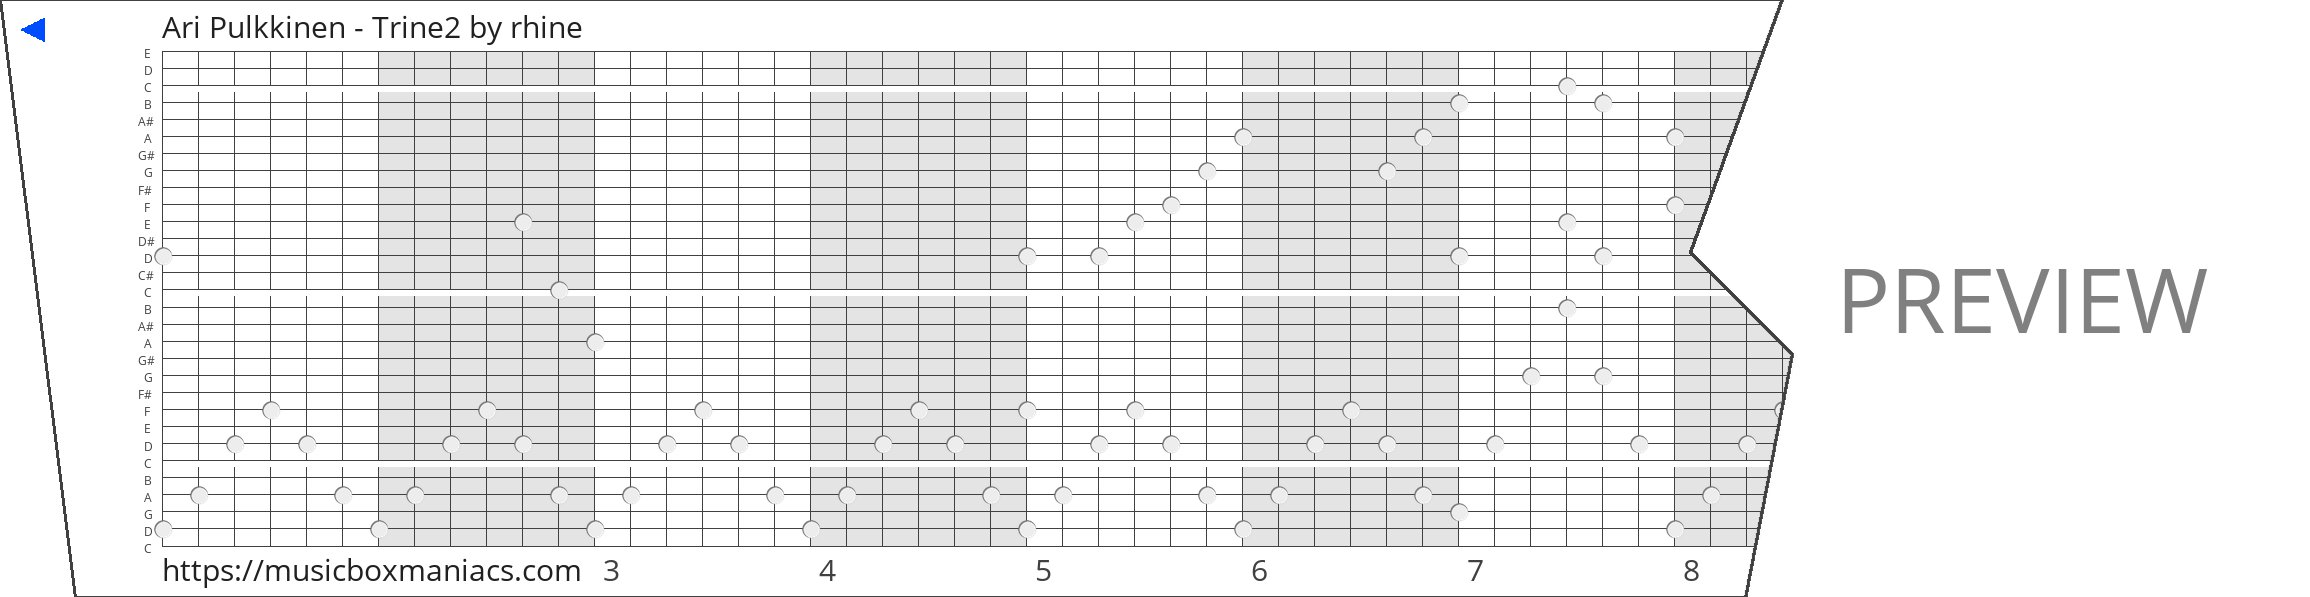 Ari Pulkkinen - Trine2 30 note music box paper strip